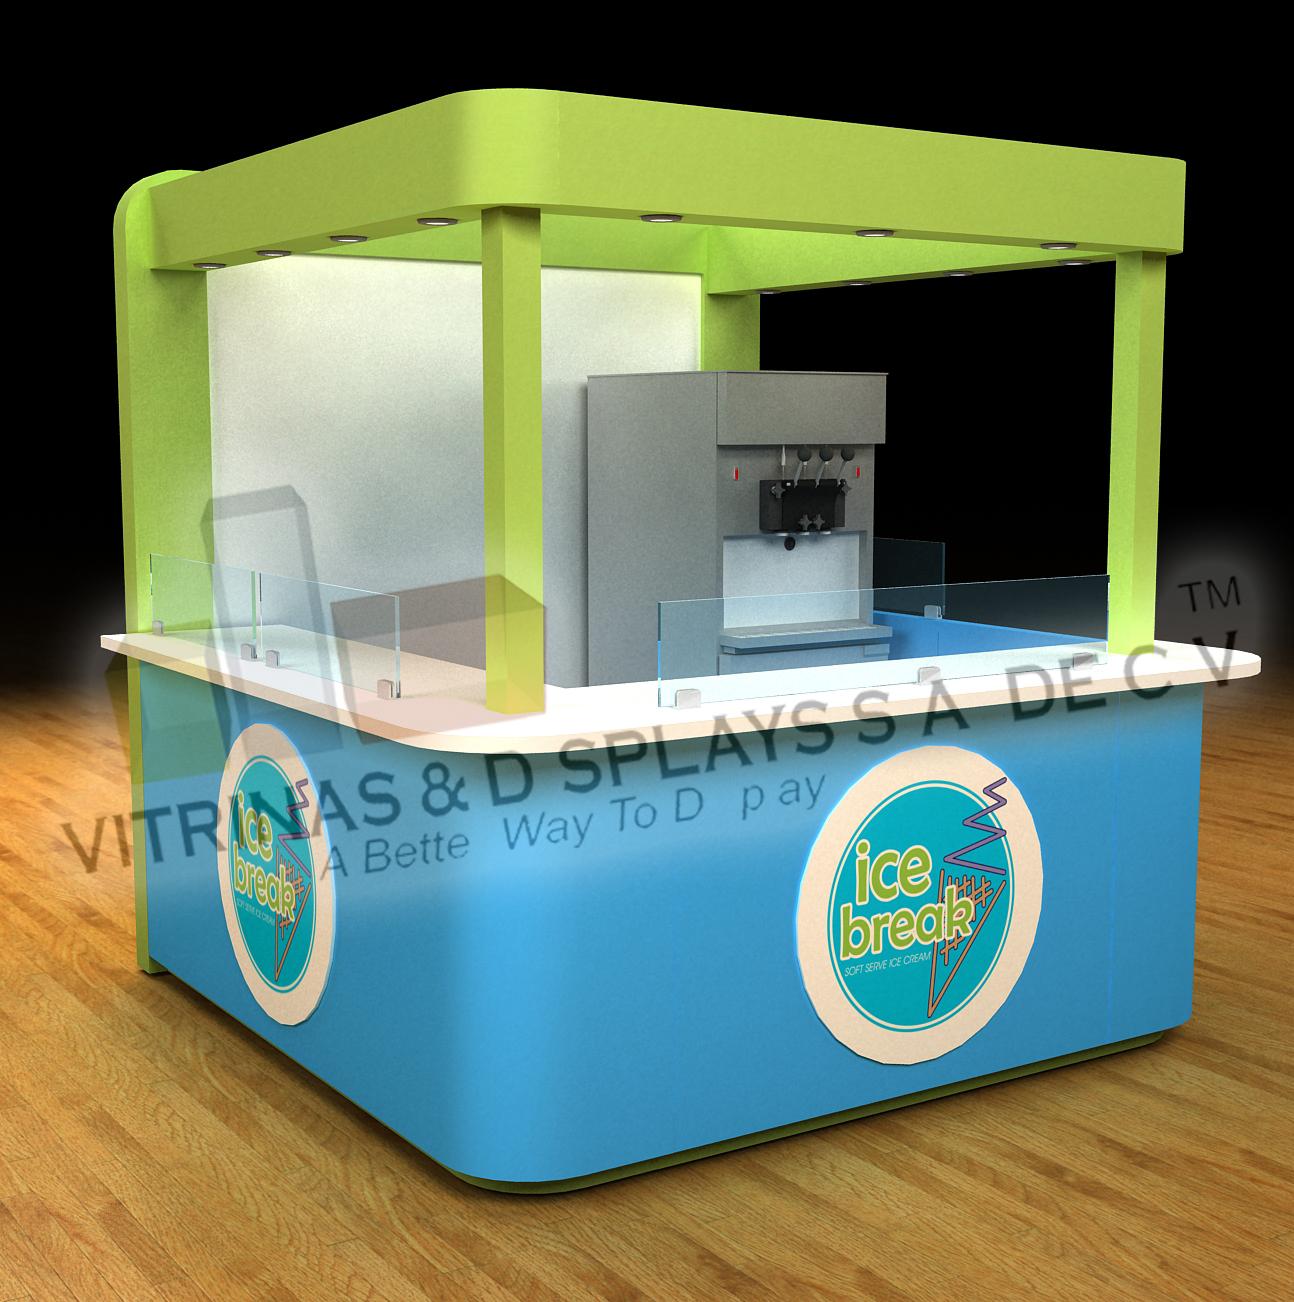 Vitrinas vitrina vitrinas exhibidores exhibidor for Disenos de kioscos de madera